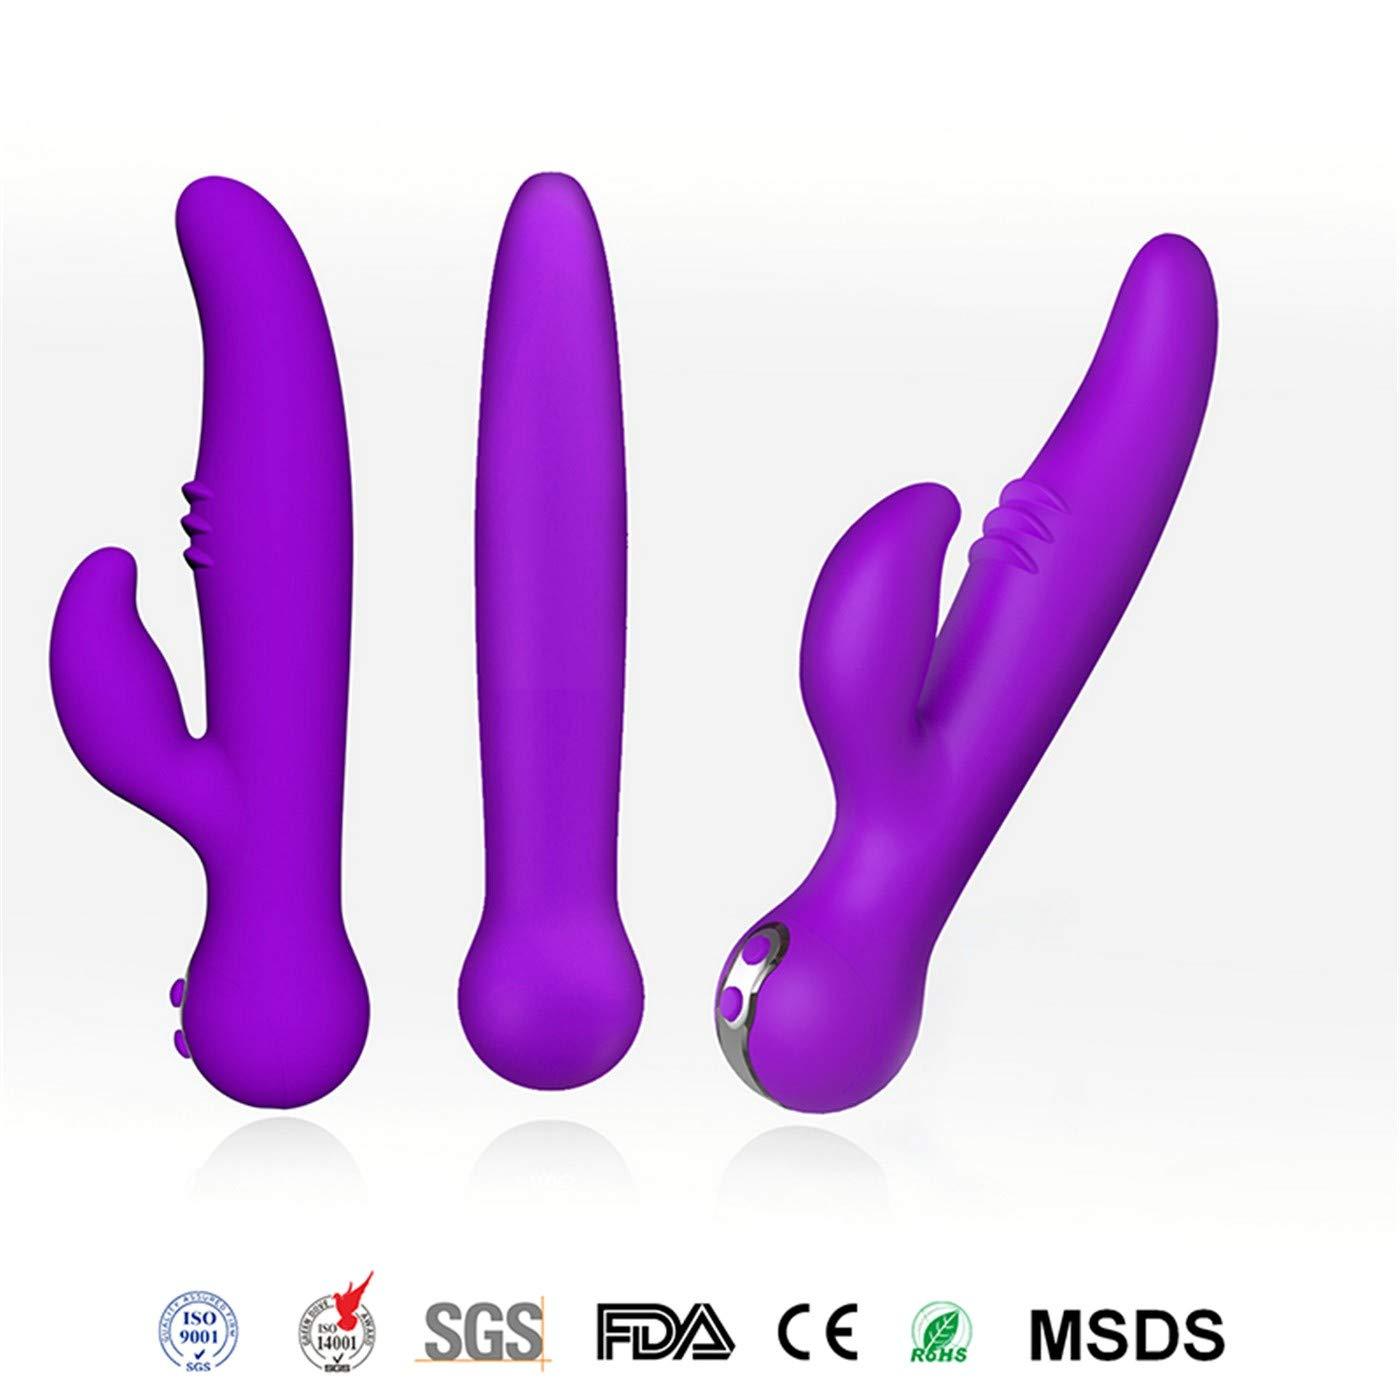 Plug Beads Toys Vibrator Vibrator Female AV Vibrating Vagina Clitoral Vaginal Anal Plug Tail Big Massage Stick Bluetooth Remote APP Control Sex Toy for Woman Orgasm Silicone Dildos Purple